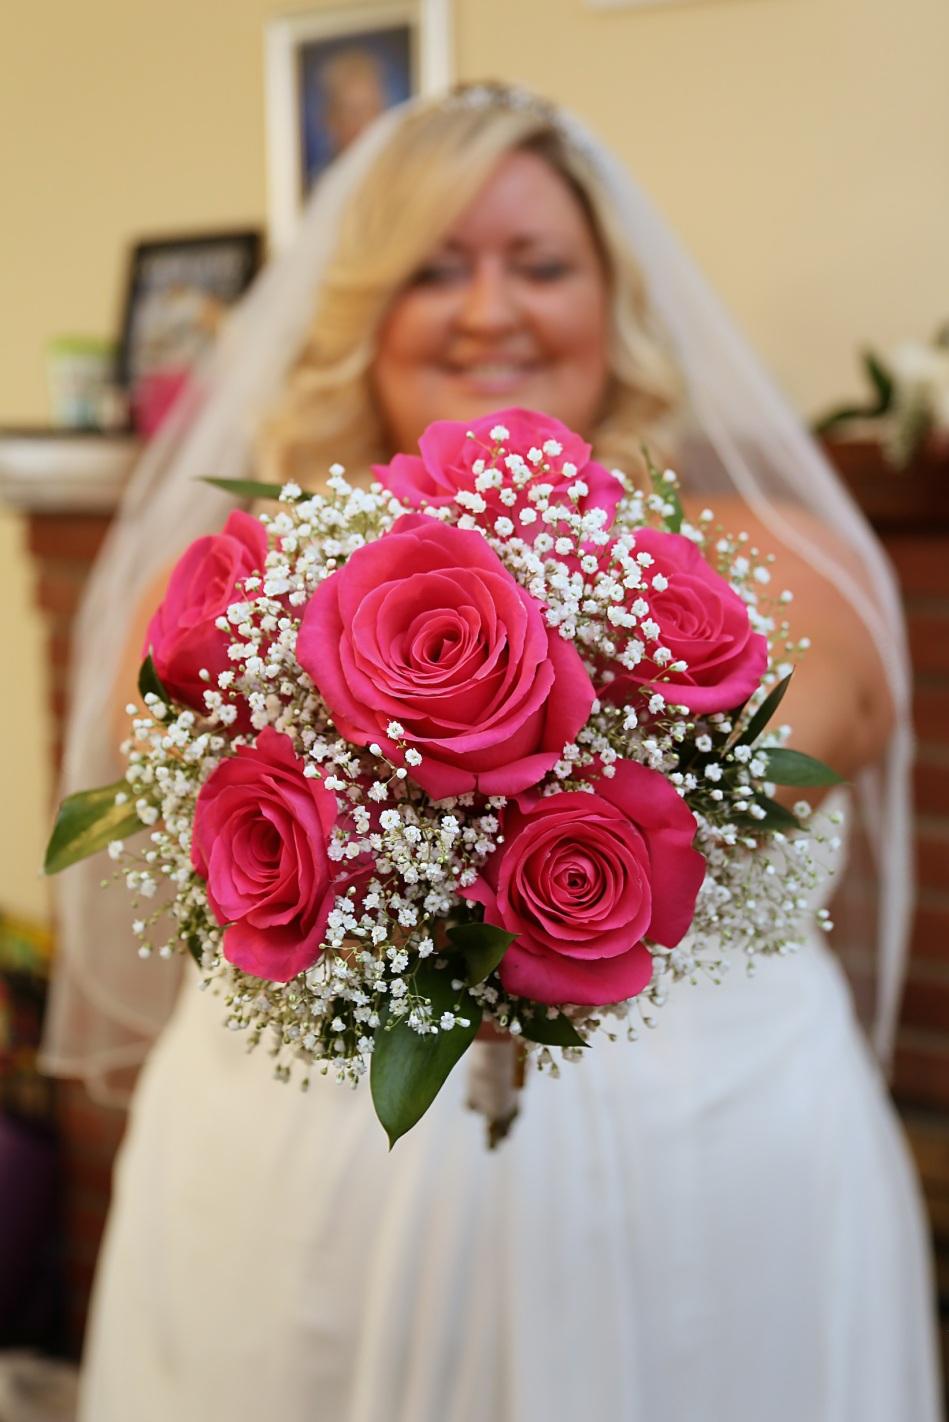 #bridetobe, #njwedding, #apicturesquememoryphotography, #weddings, #pomptonlakesnjwedding, #bridalprep, #bouquet